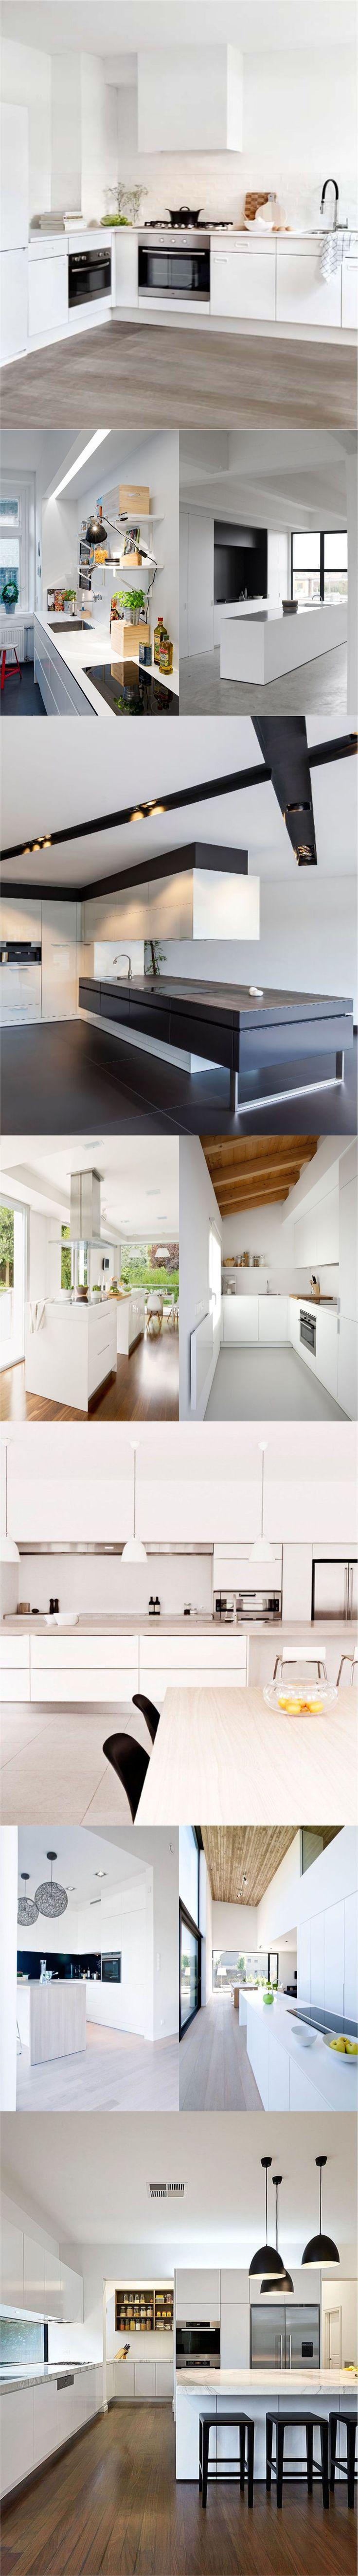 2361 best Interior Decoration images on Pinterest | Bedroom, Flats ...